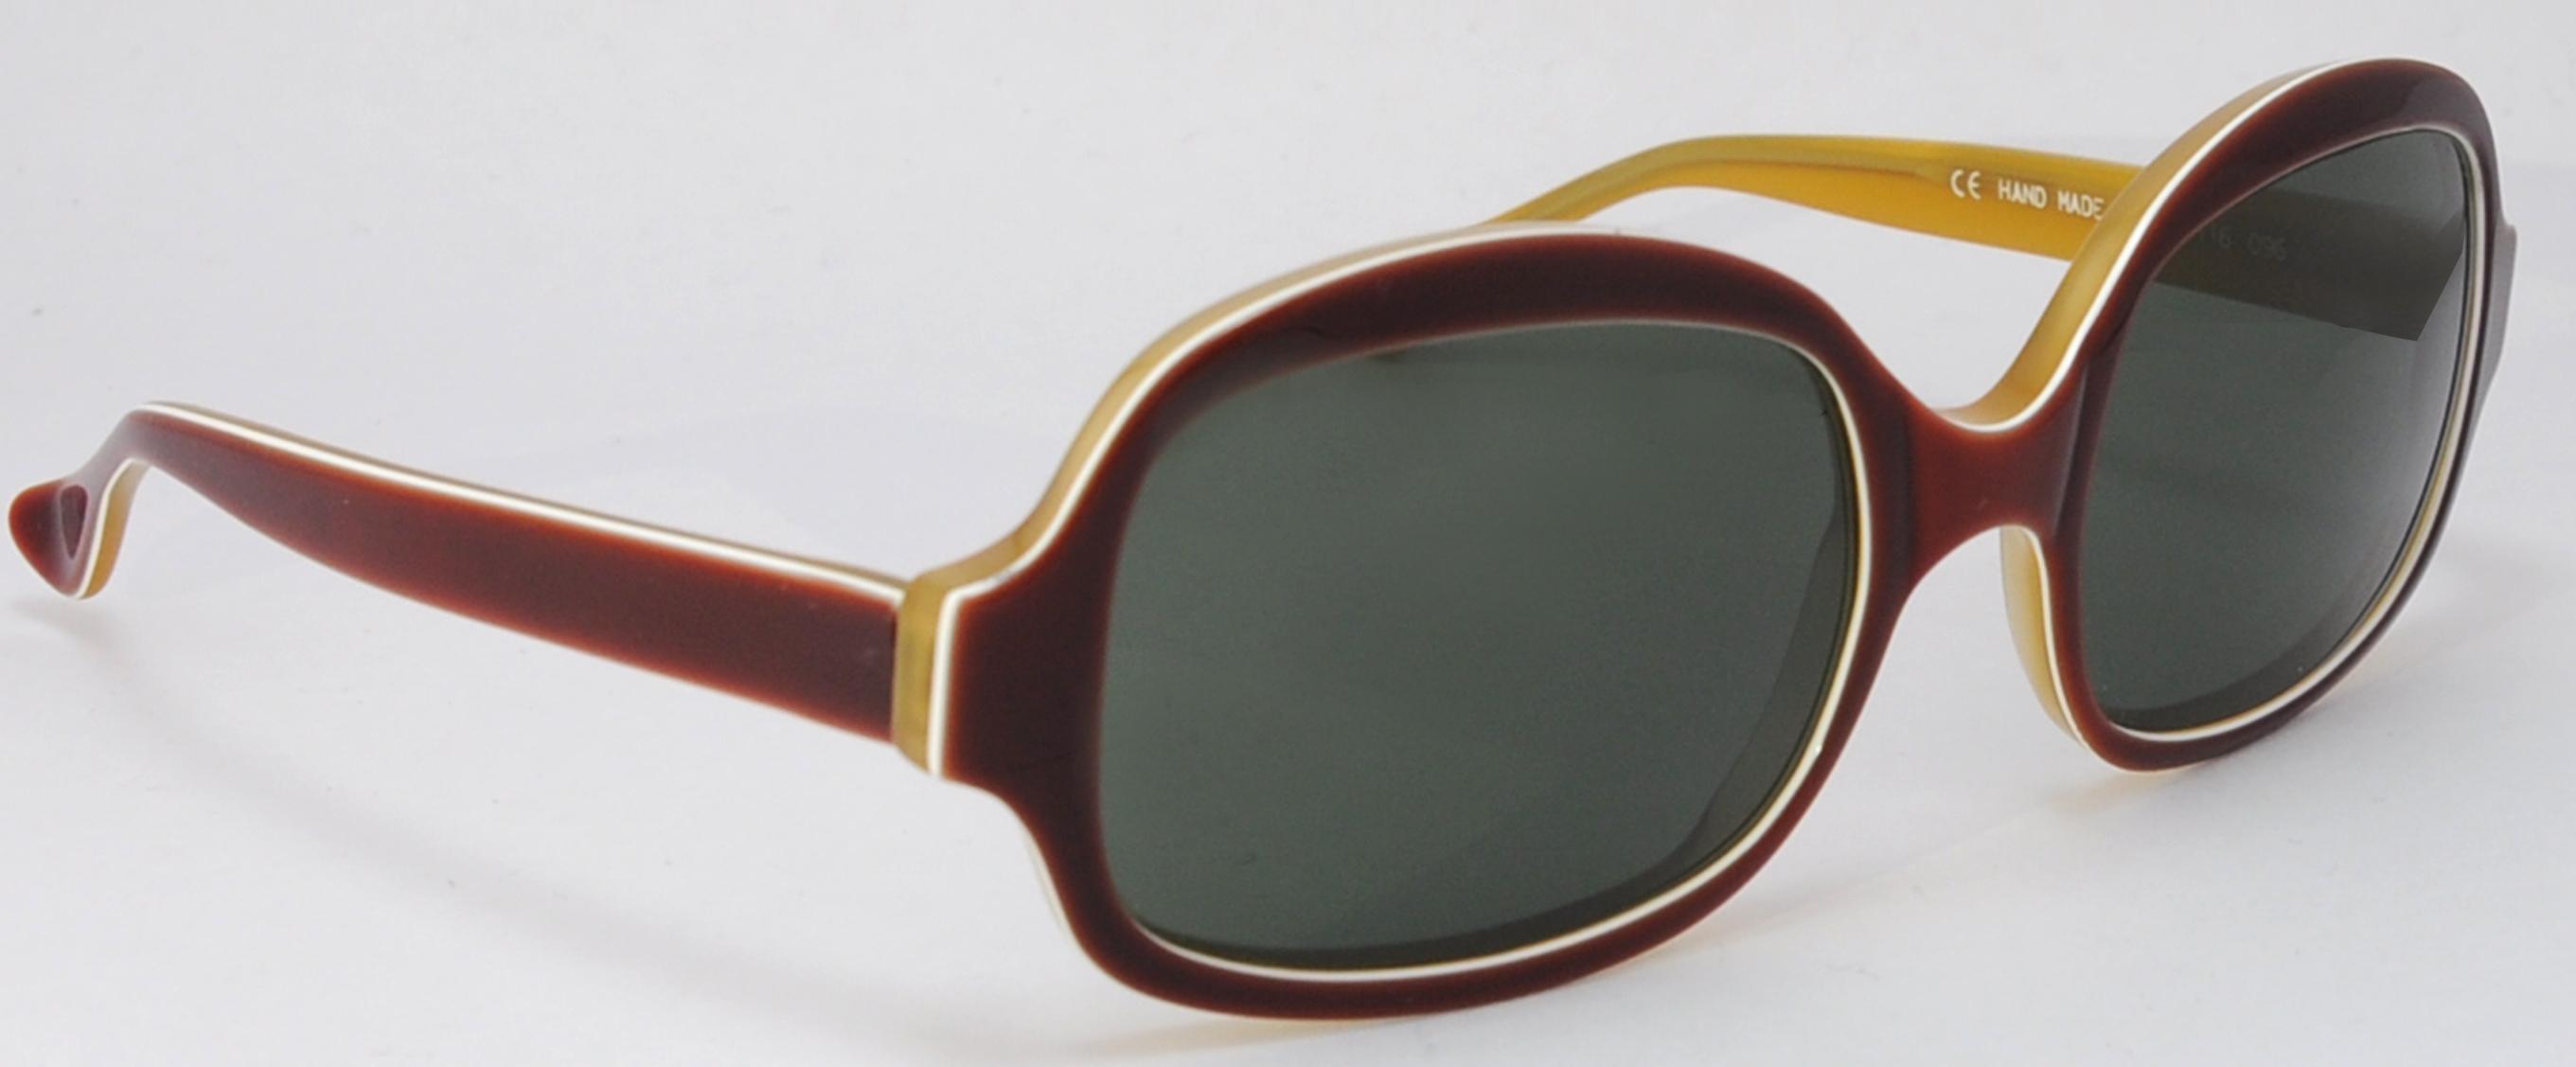 lunetist_-_lunettes_vintage_-_monture_beausoleil_2.jpg